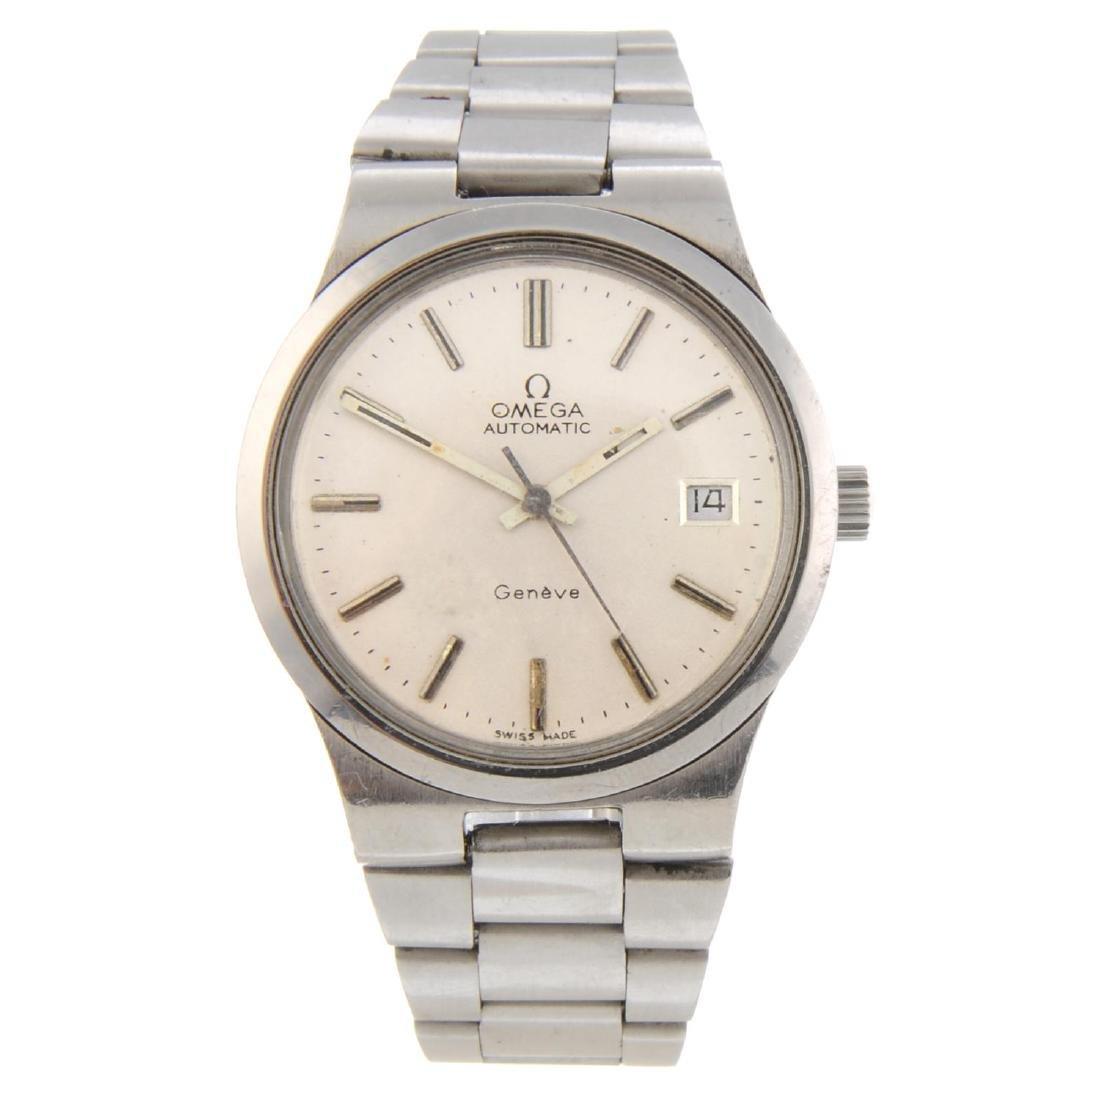 OMEGA - a gentleman's Genève bracelet watch. Stainless